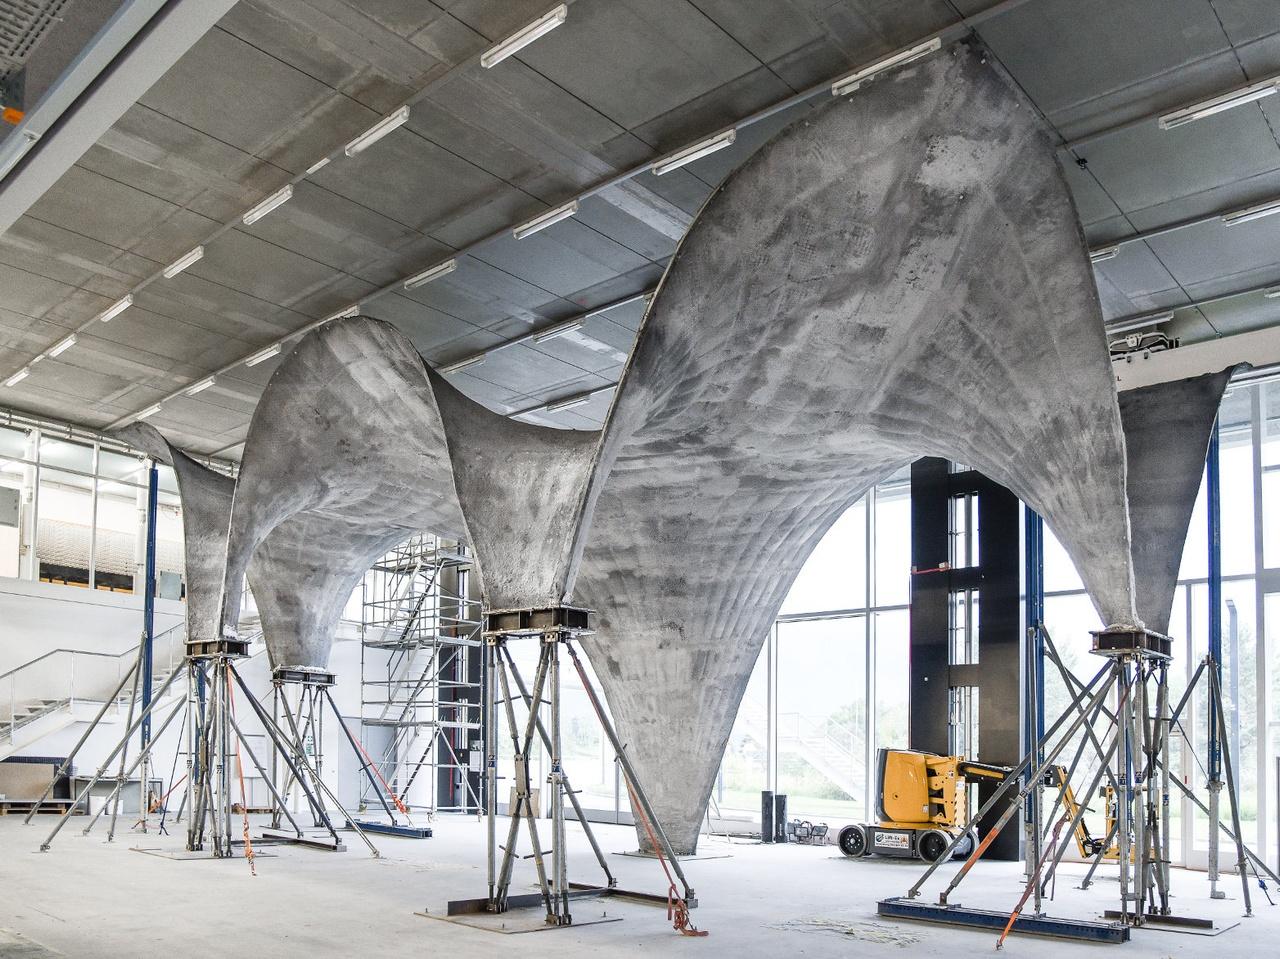 Ovaj zakrivljena betonska ljuska debela je svega 3 centimetara